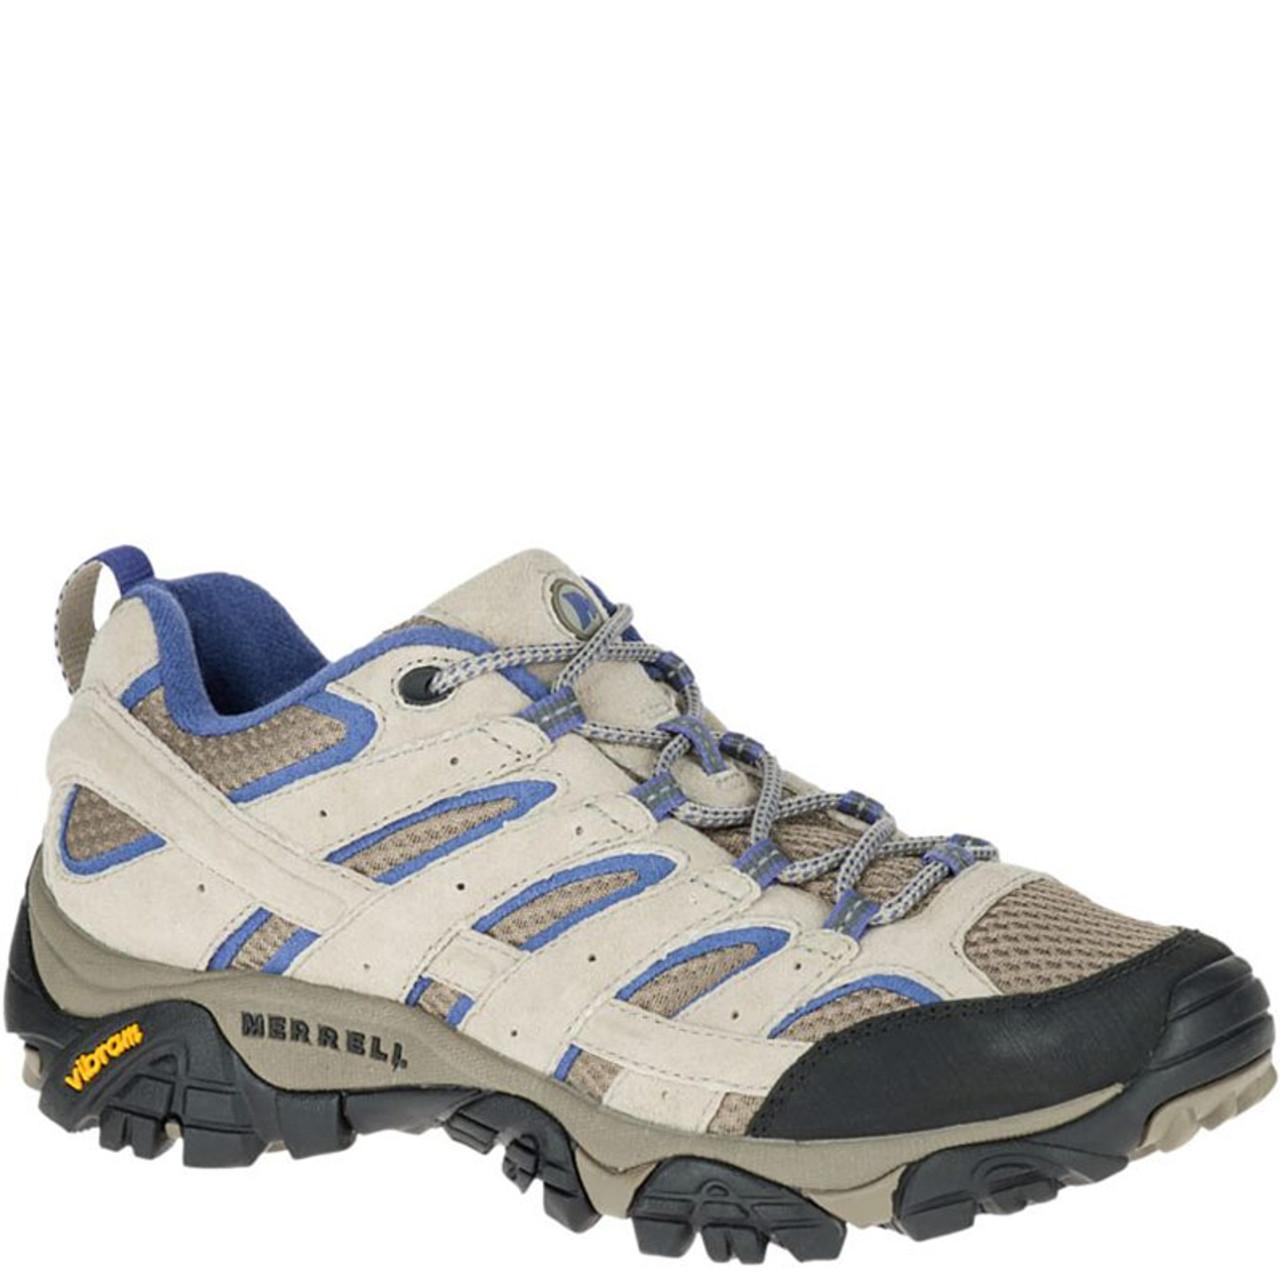 21c474a6 Merrell J06010 Women's MOAB 2 VENTILATOR Hiking Shoes Aluminum Marlin